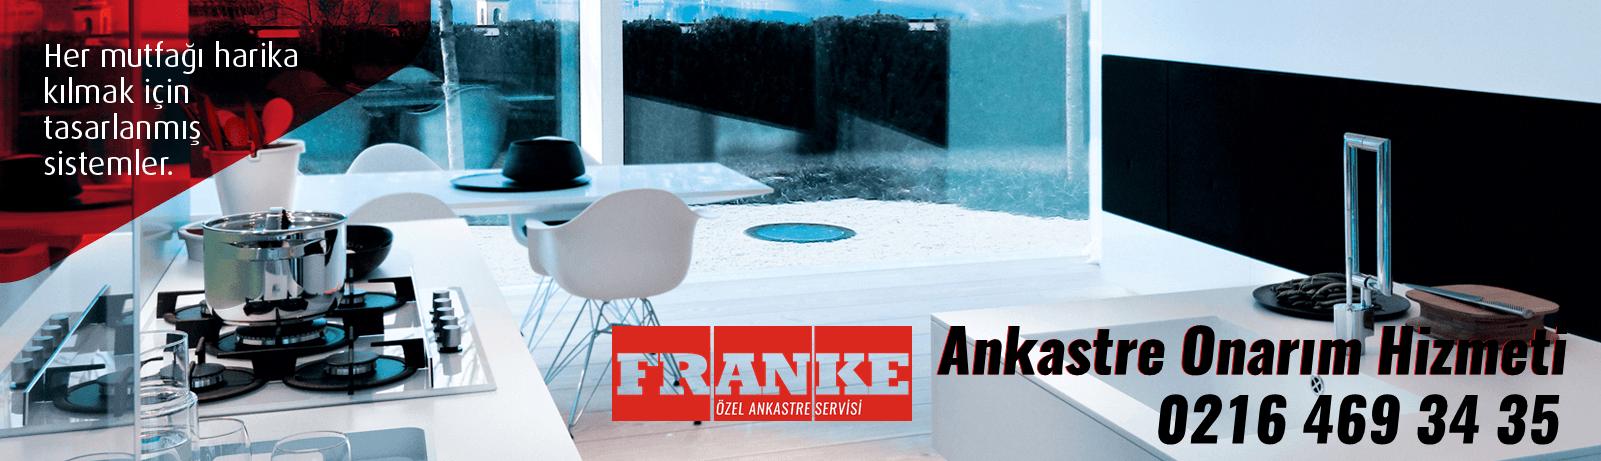 Erenköy Franke Servisi